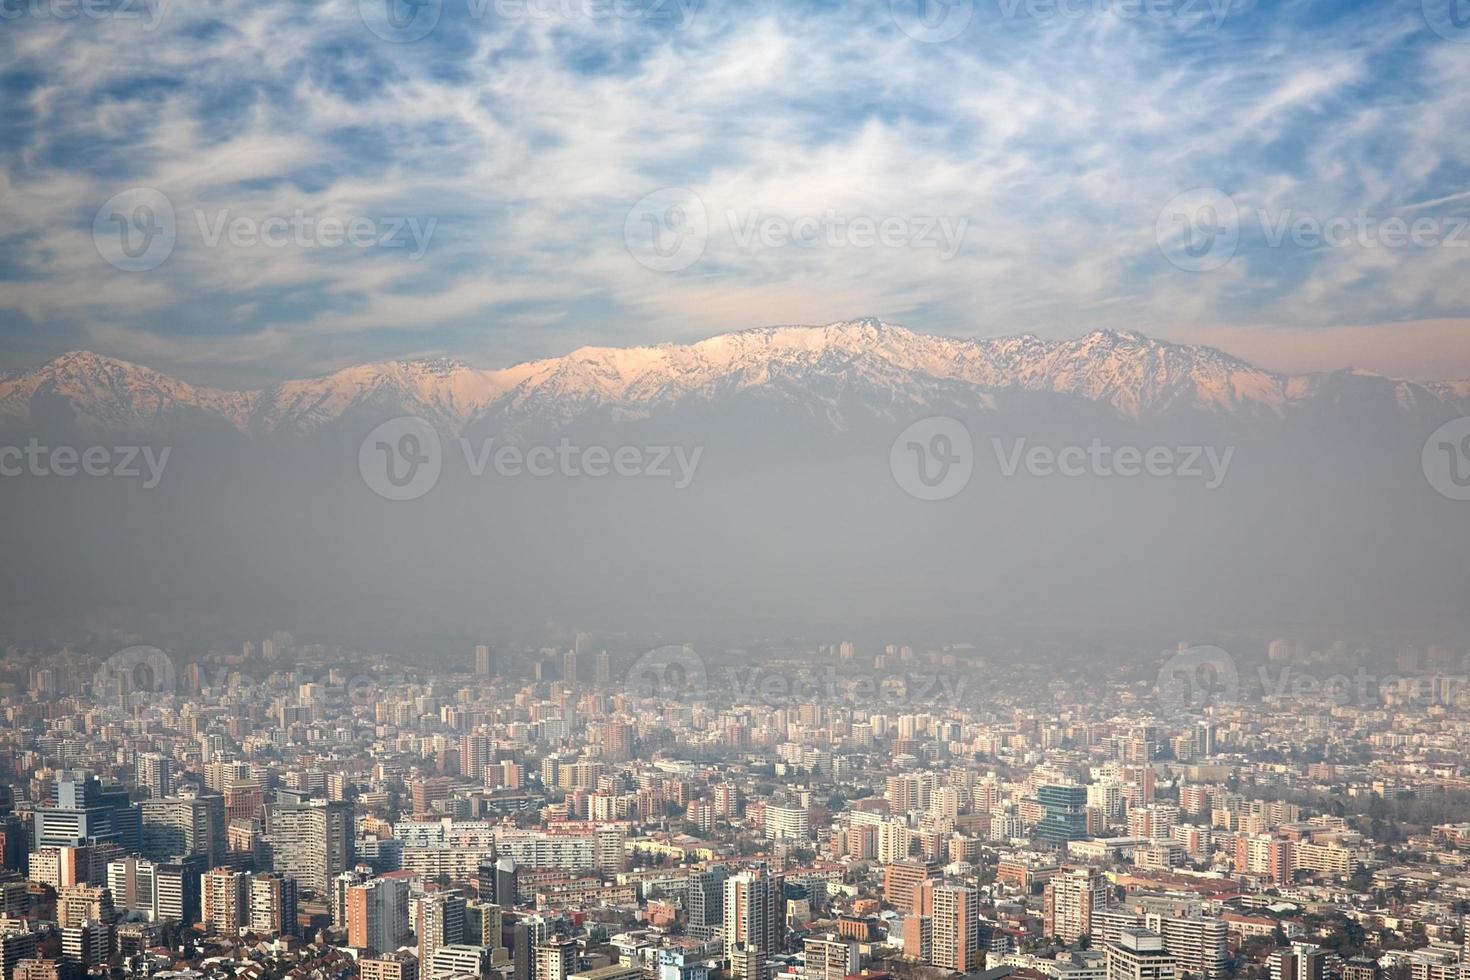 le montagne delle Ande sovrastano santiago, Cile foto